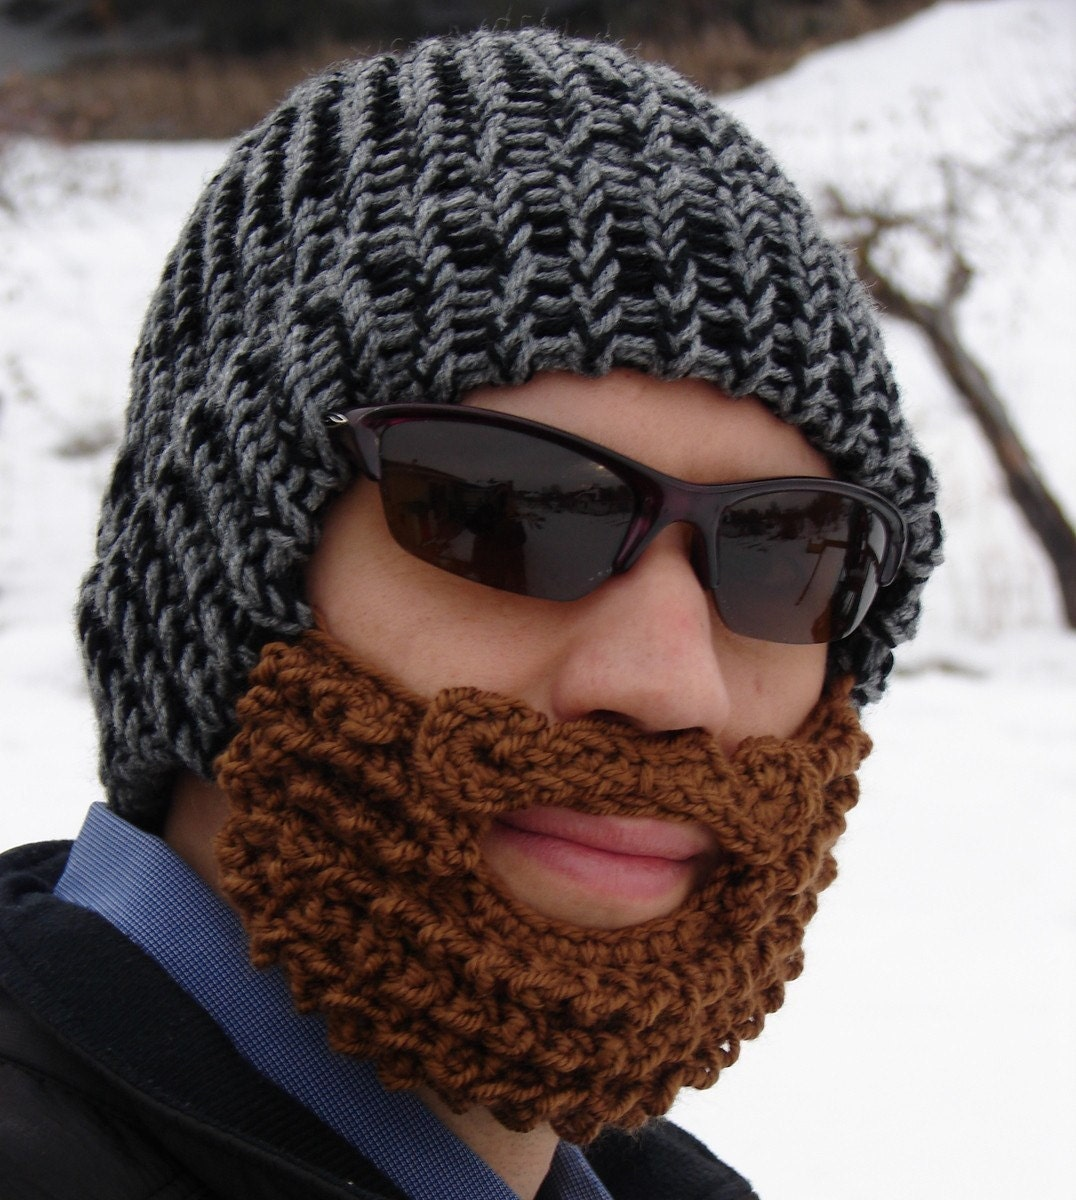 Black And Gray Bearded Lumberjack Hat